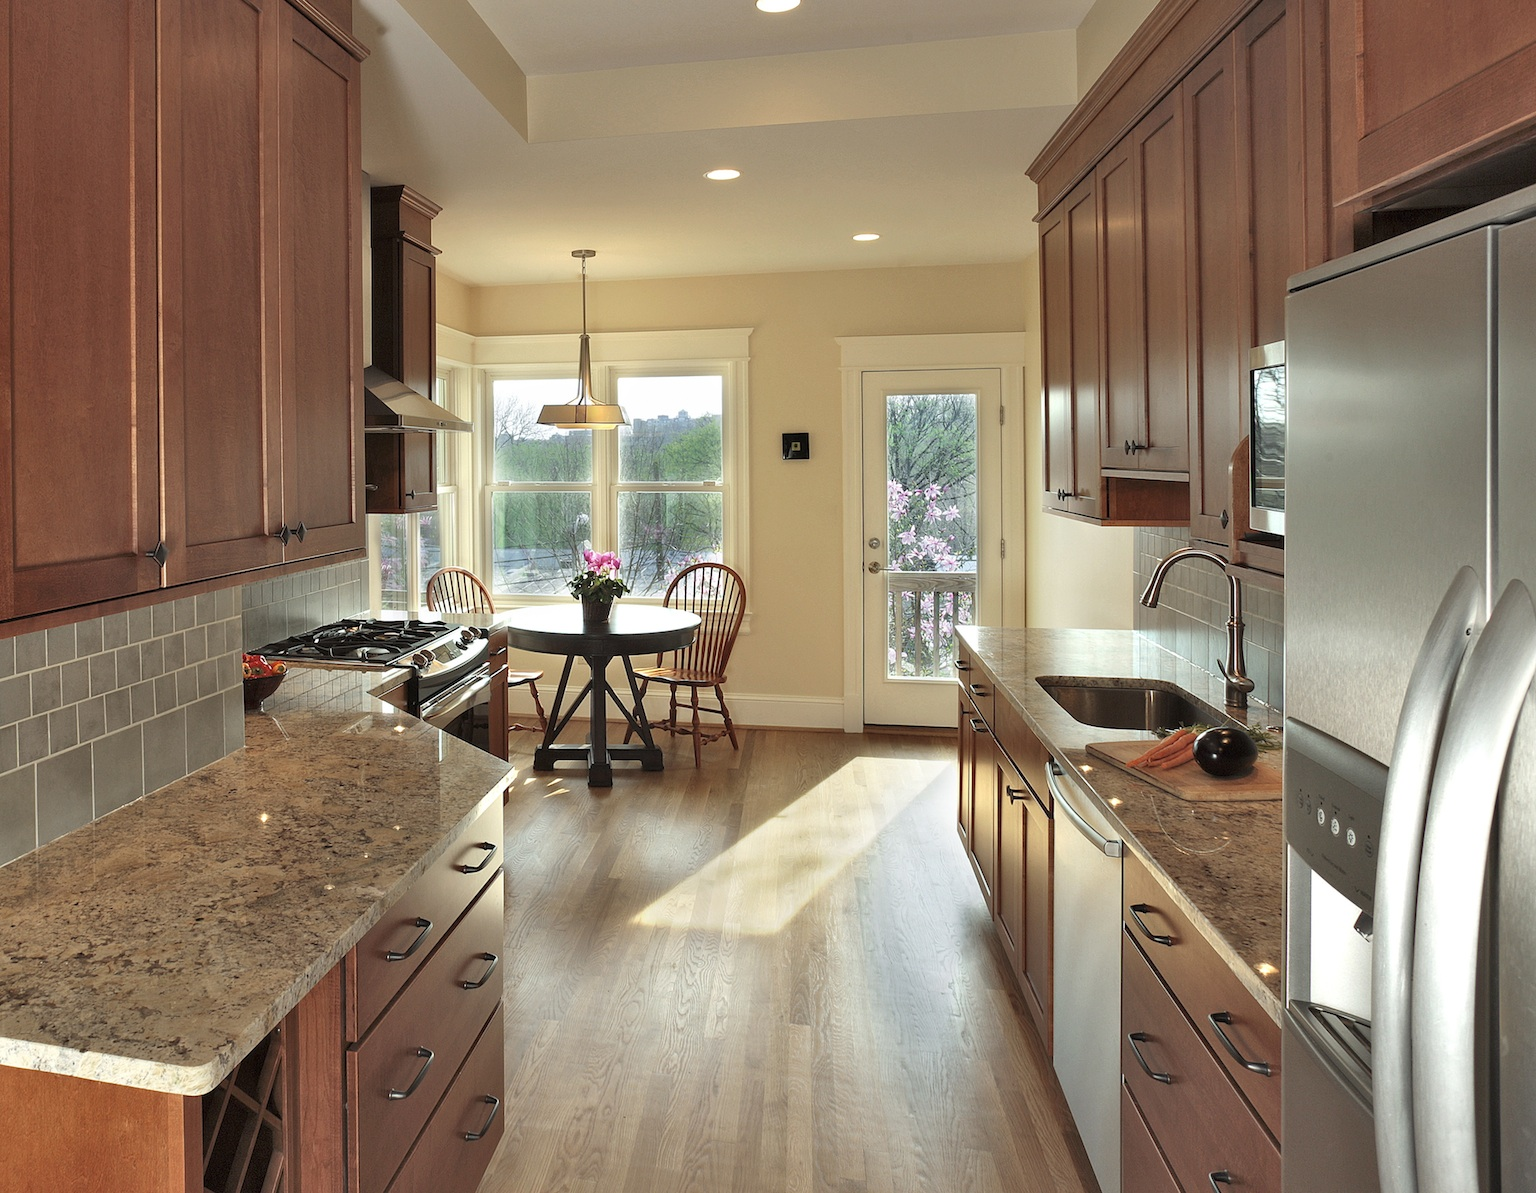 northern virginia, maryland and washington d.c. kitchen remodeling